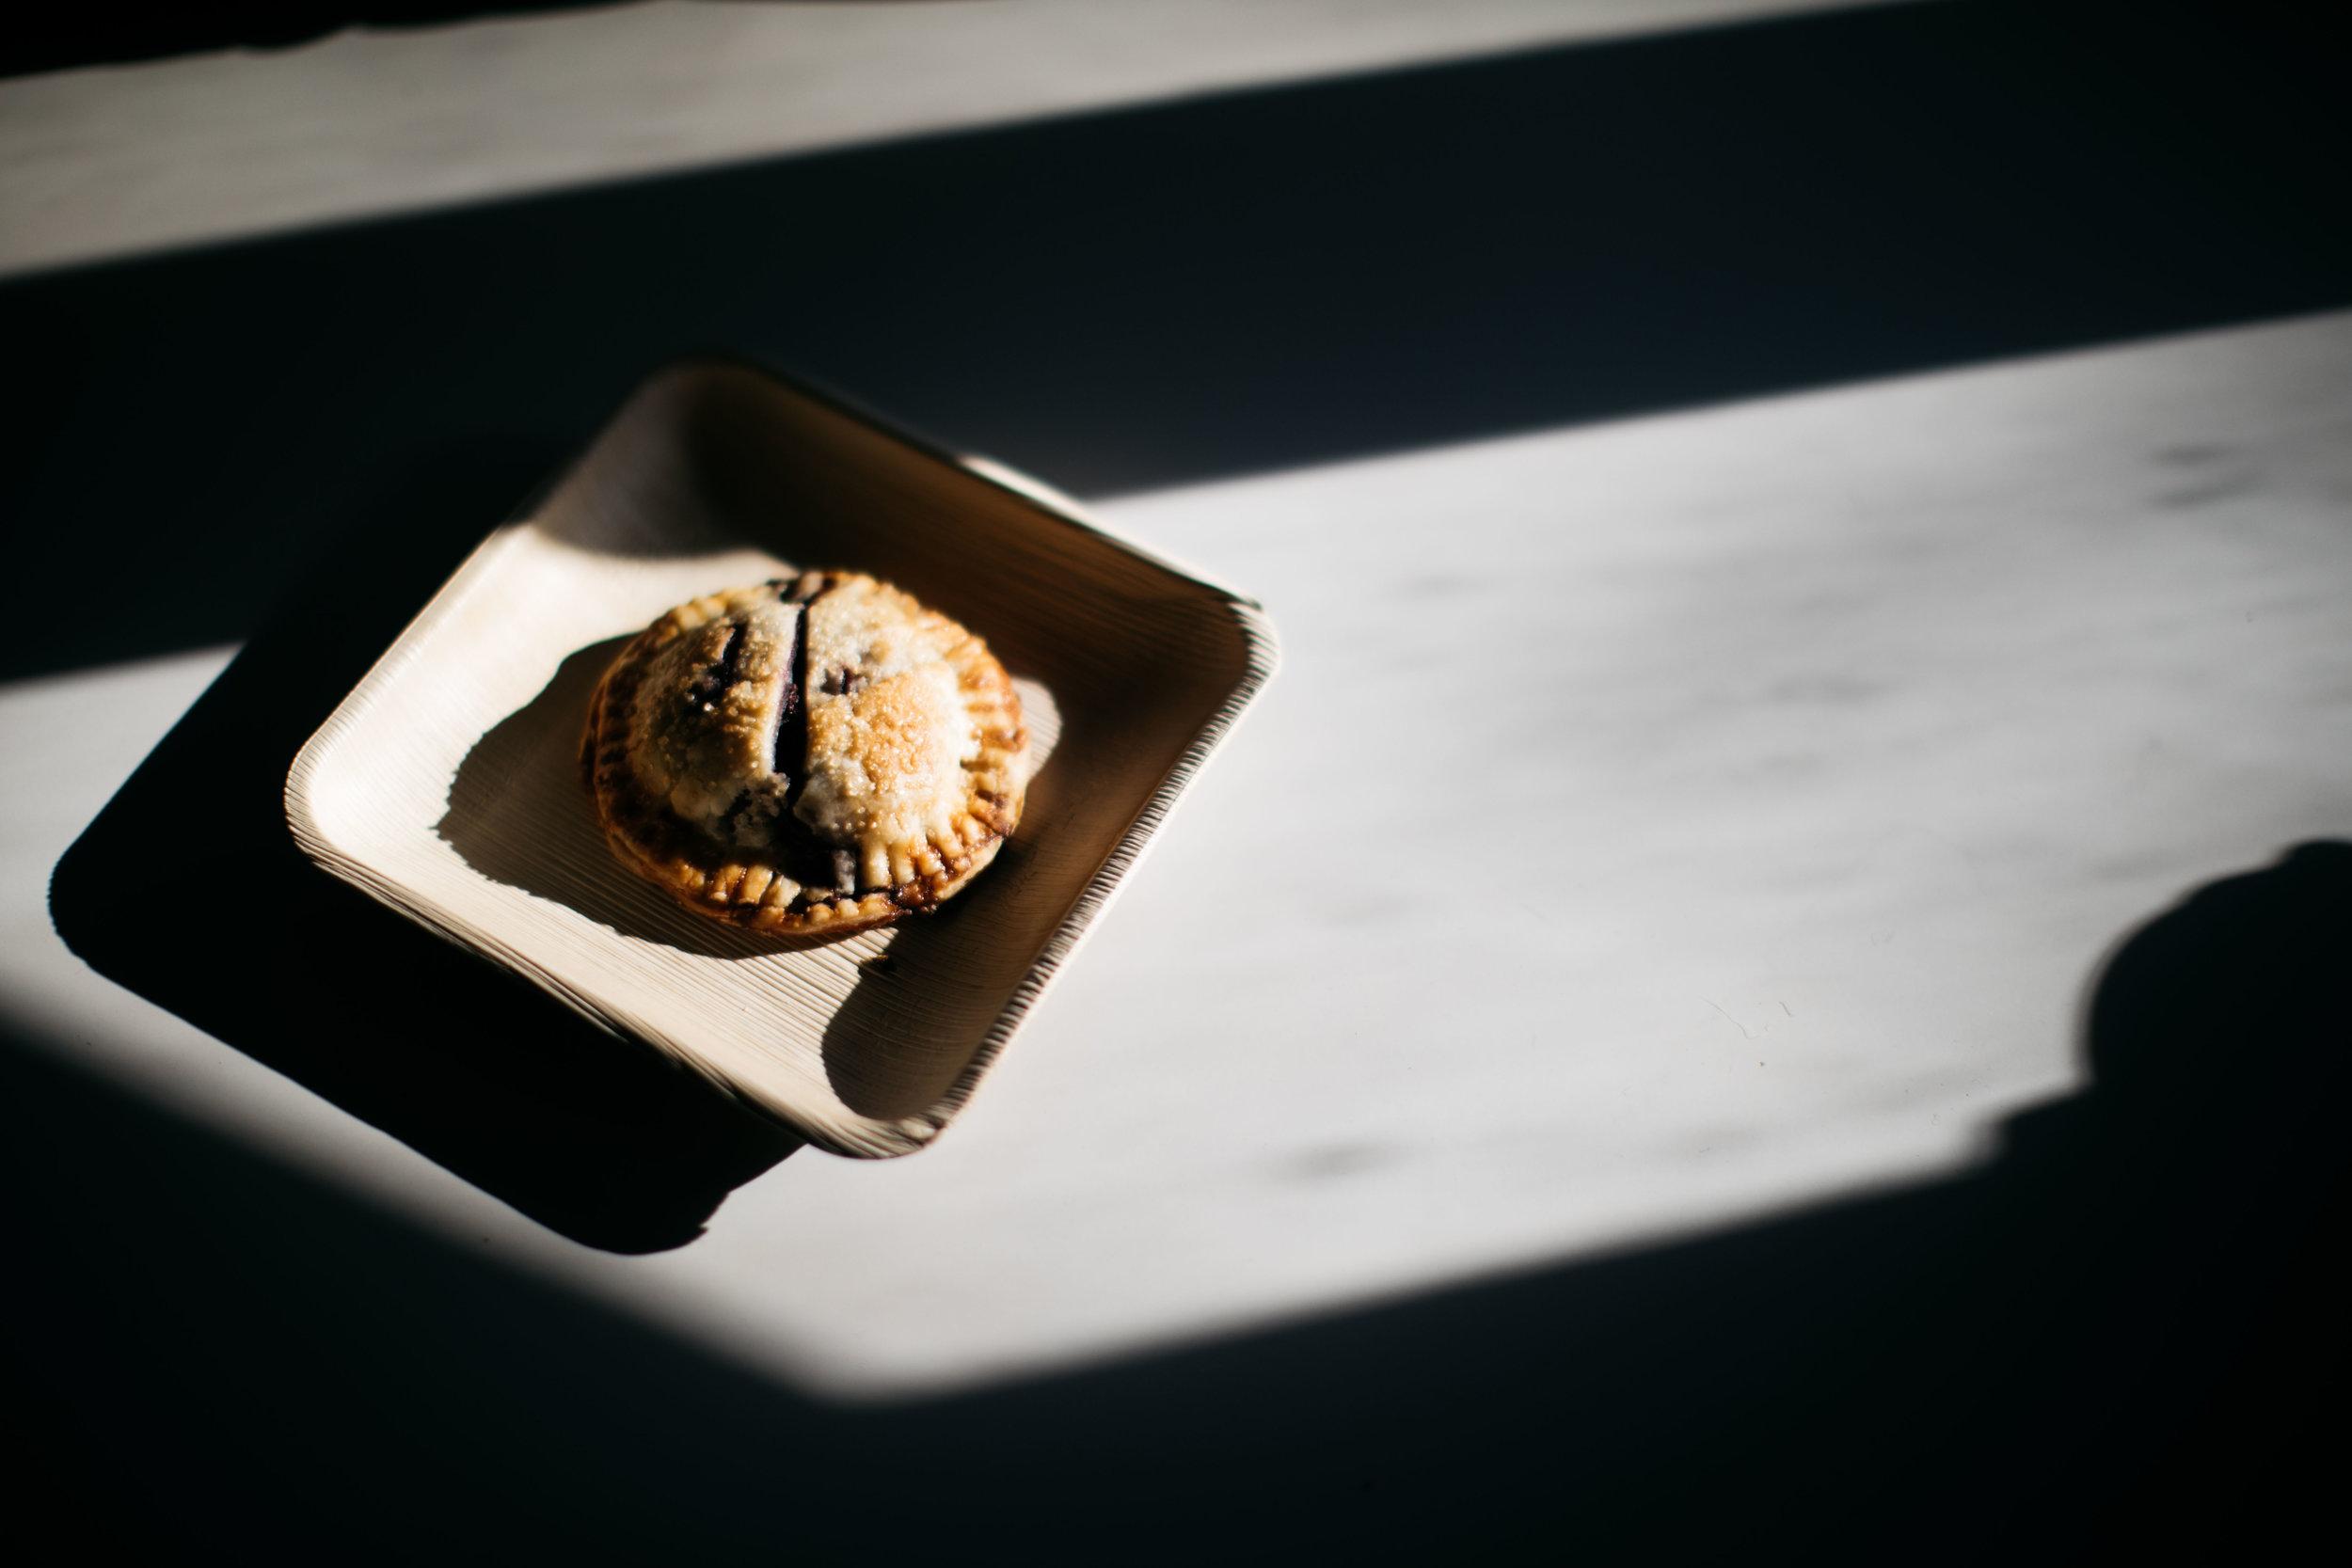 Tiny Kitchen Co Pies